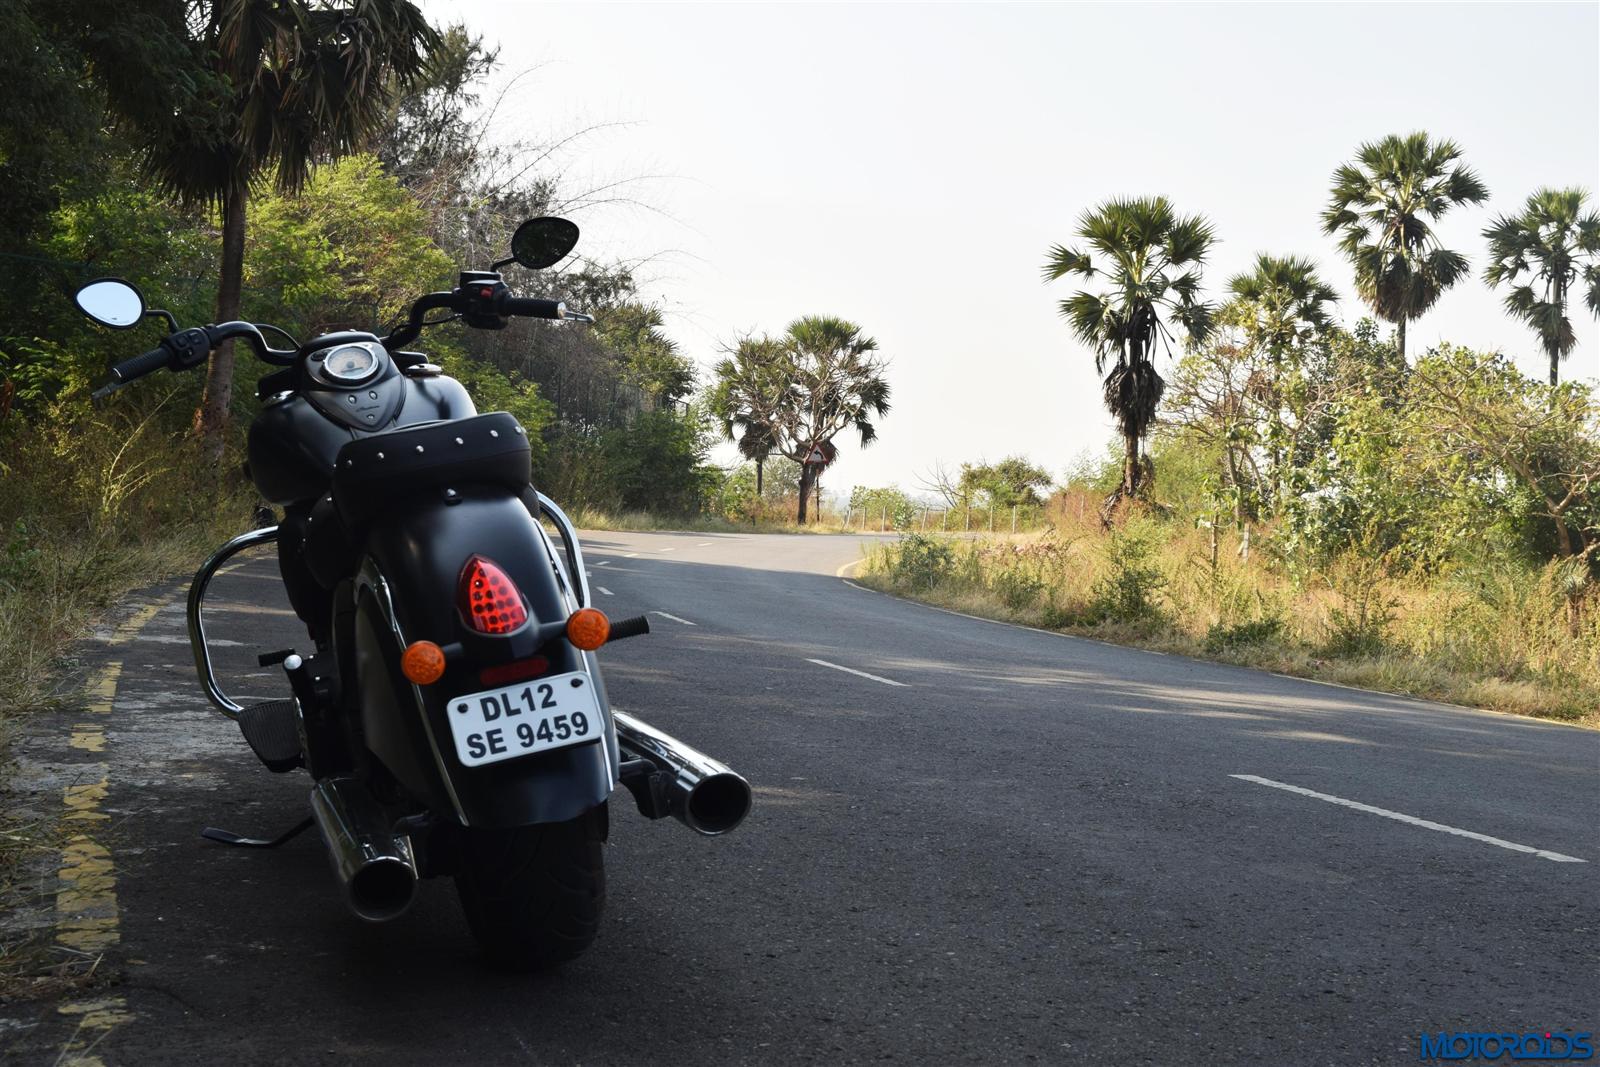 Indian Dark Horse rear view (2)